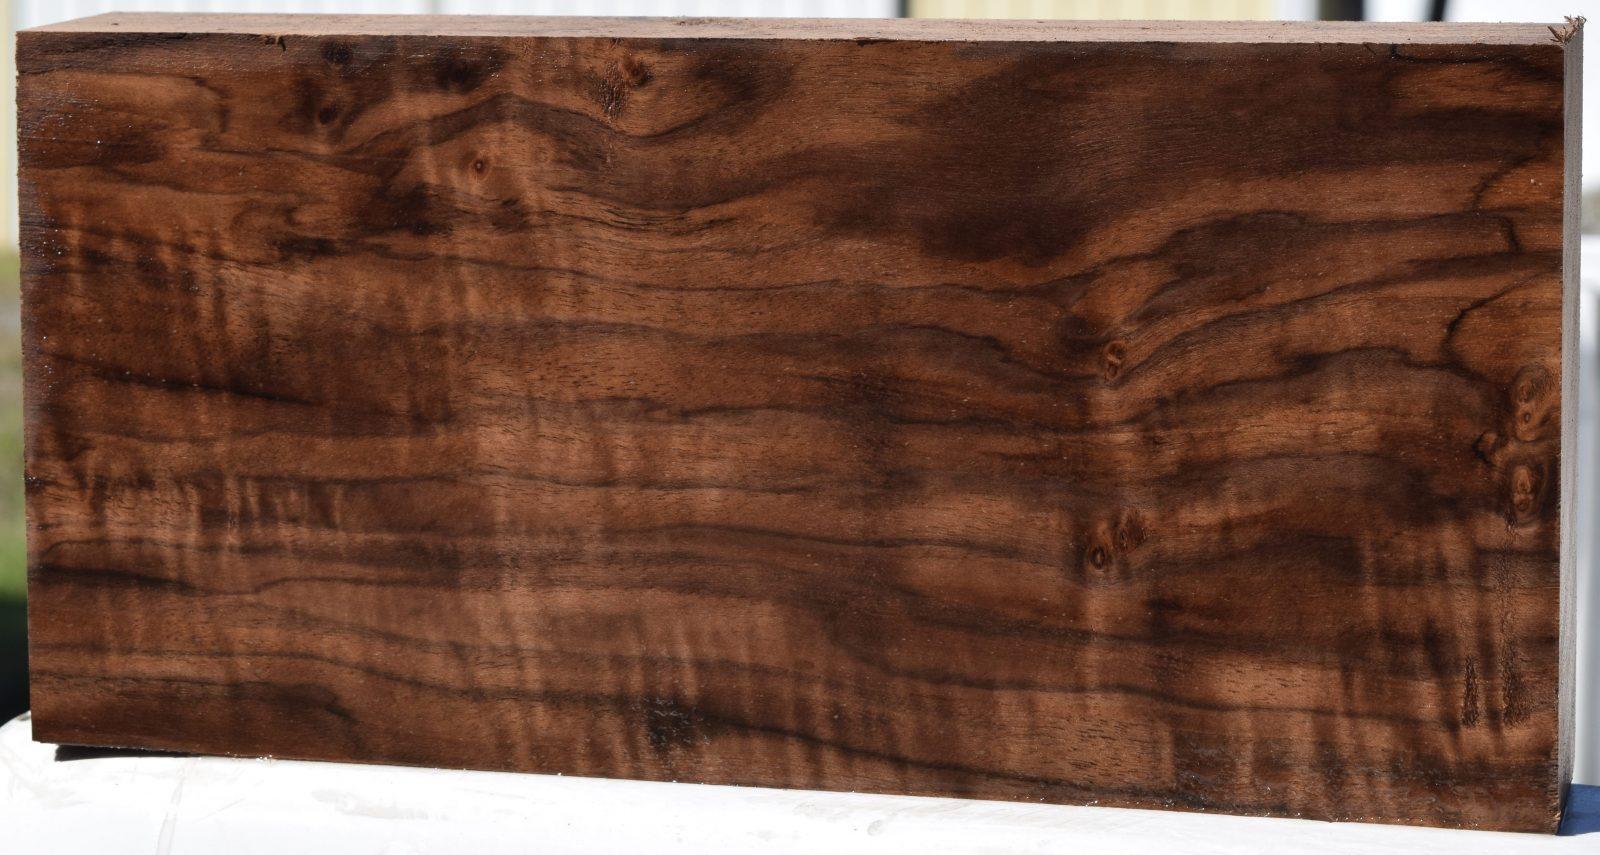 c240ca25b88 HCL-6 Highly Figured Claro Walnut Board Block 12